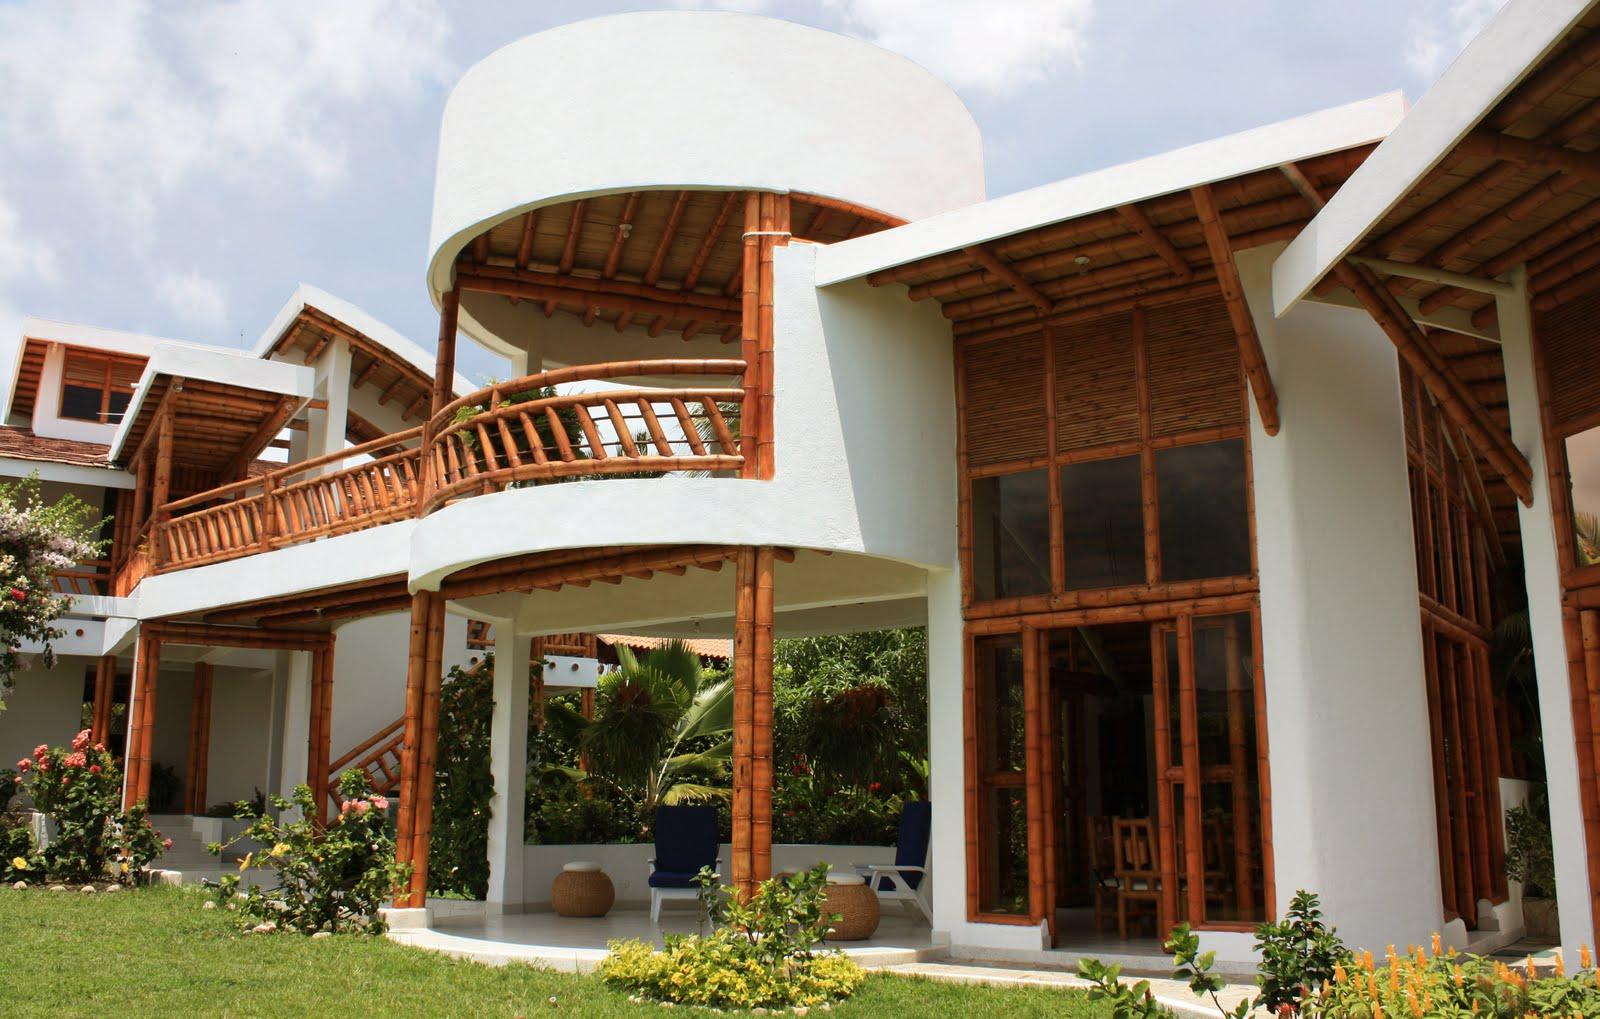 El bamb como material de construcci n portal ondac for Cubiertas para casas campestres